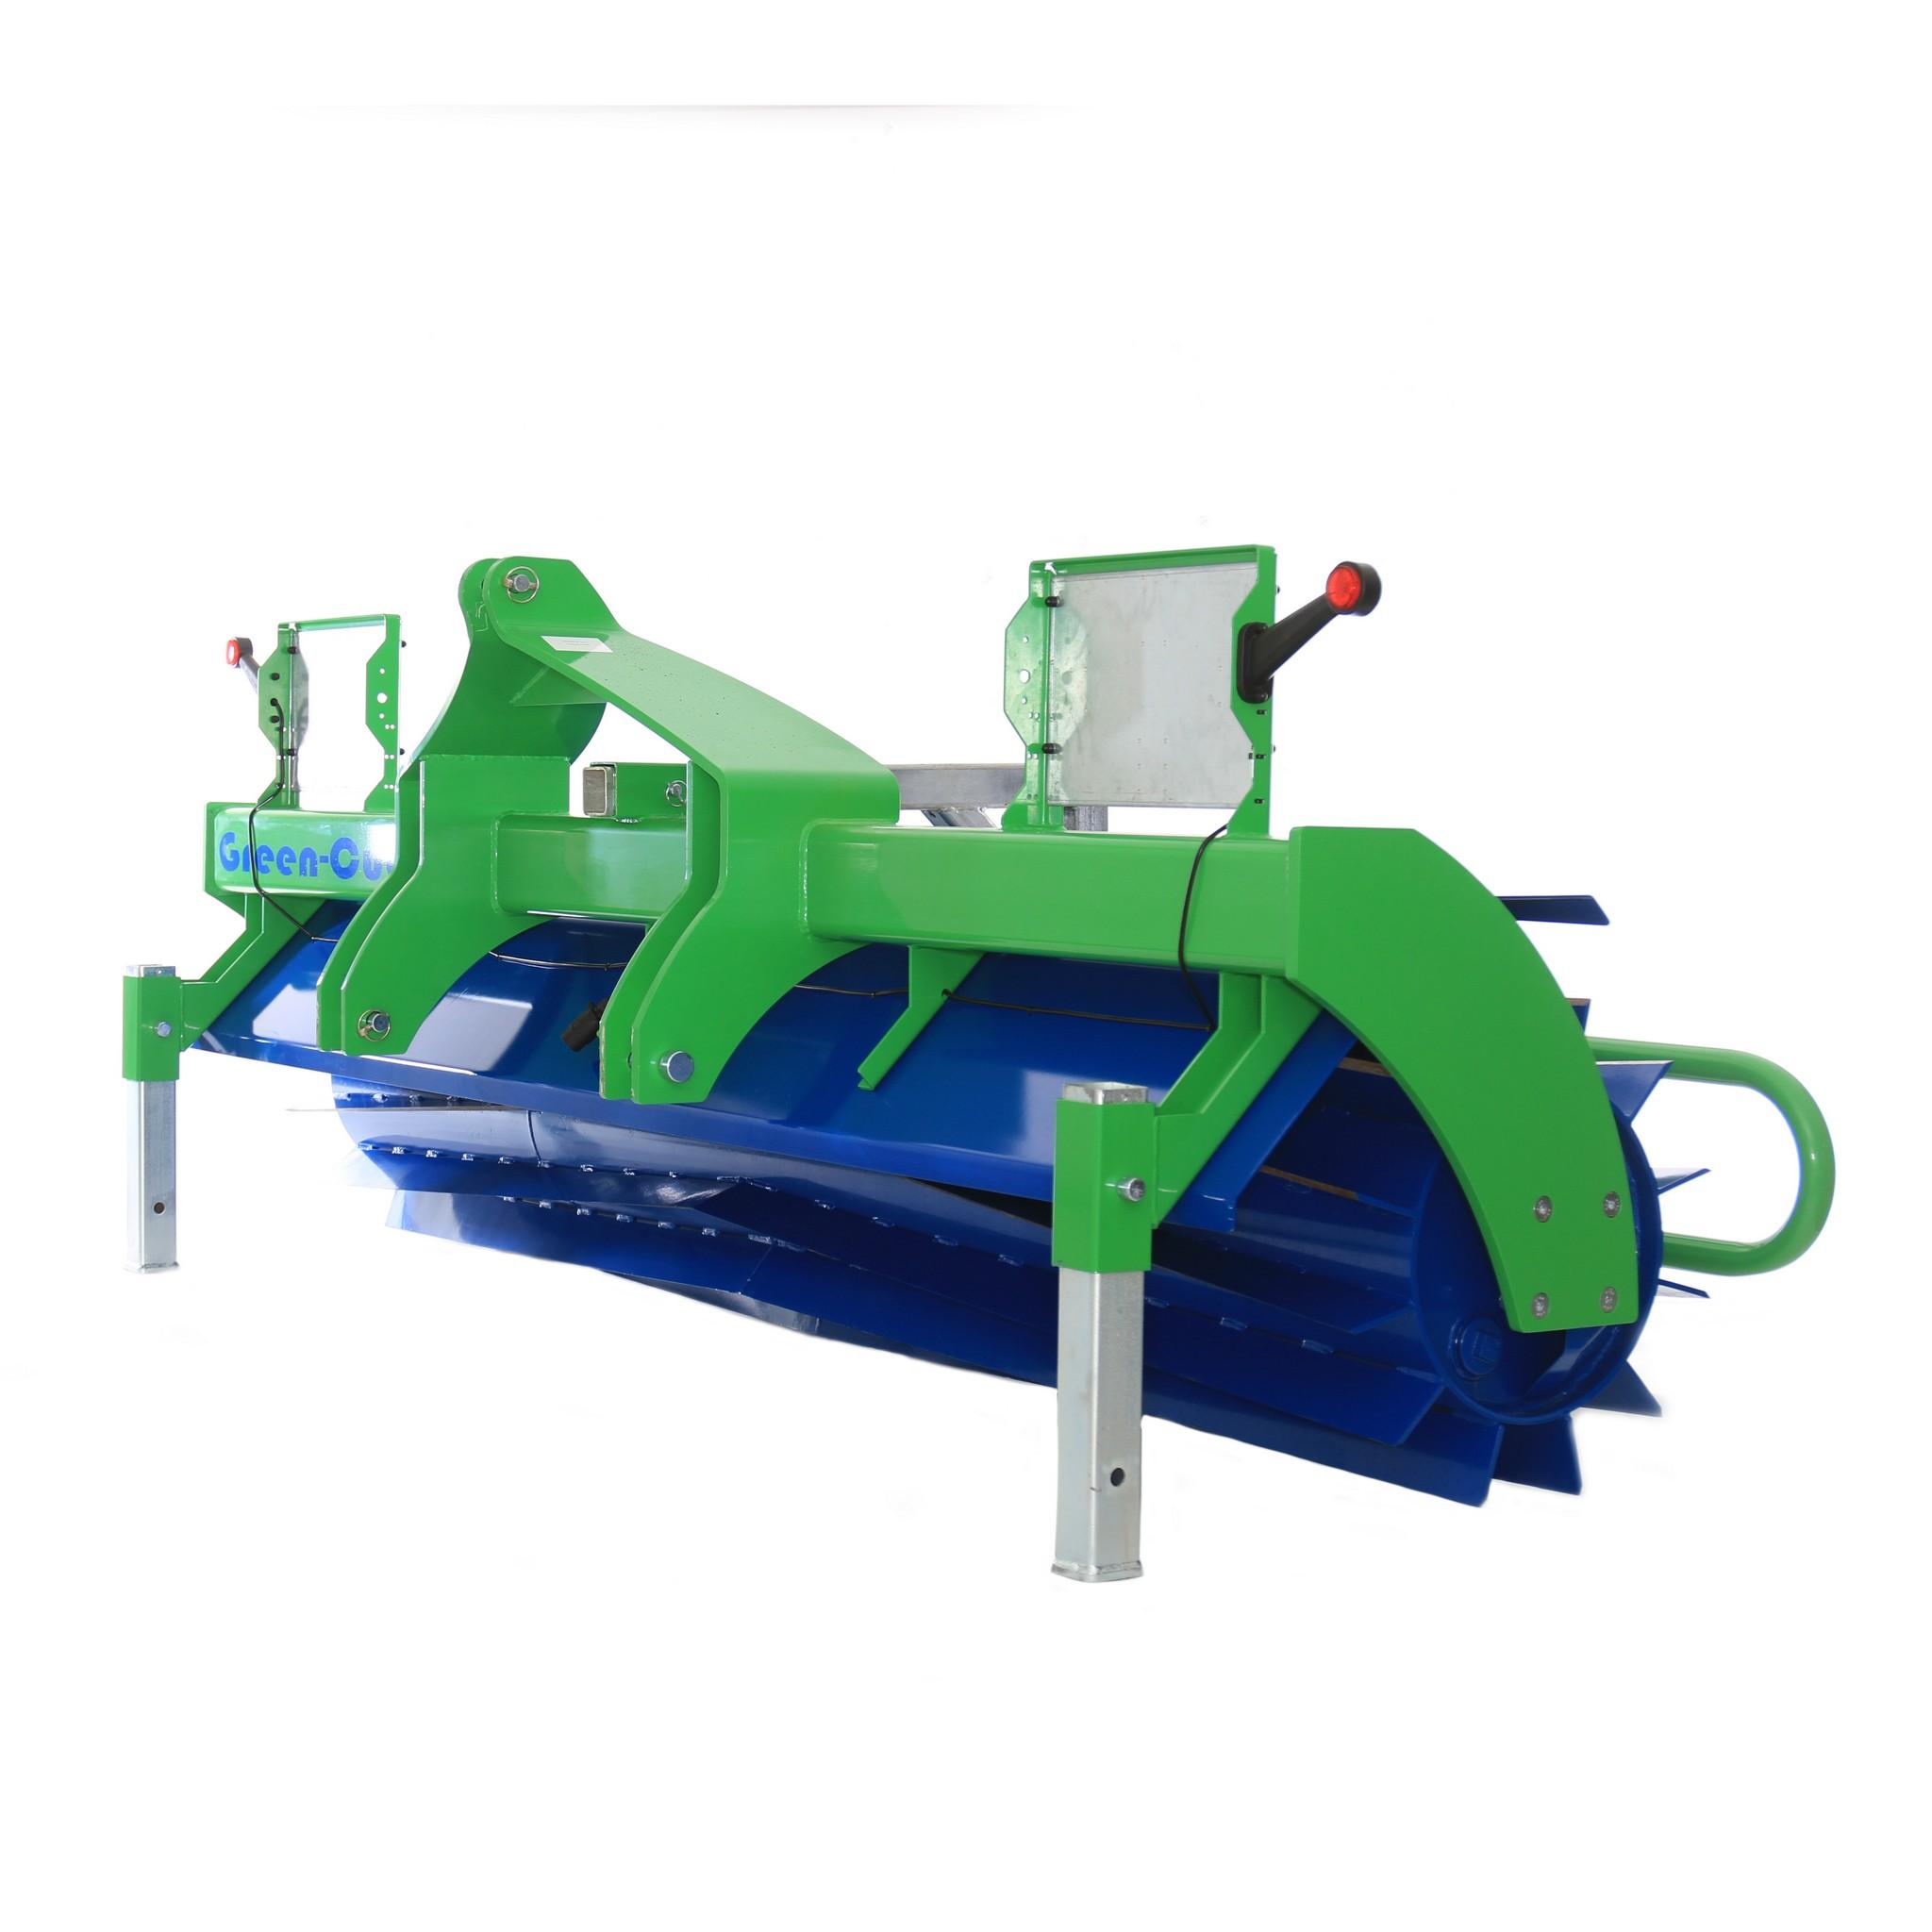 GreenCutter CGC600